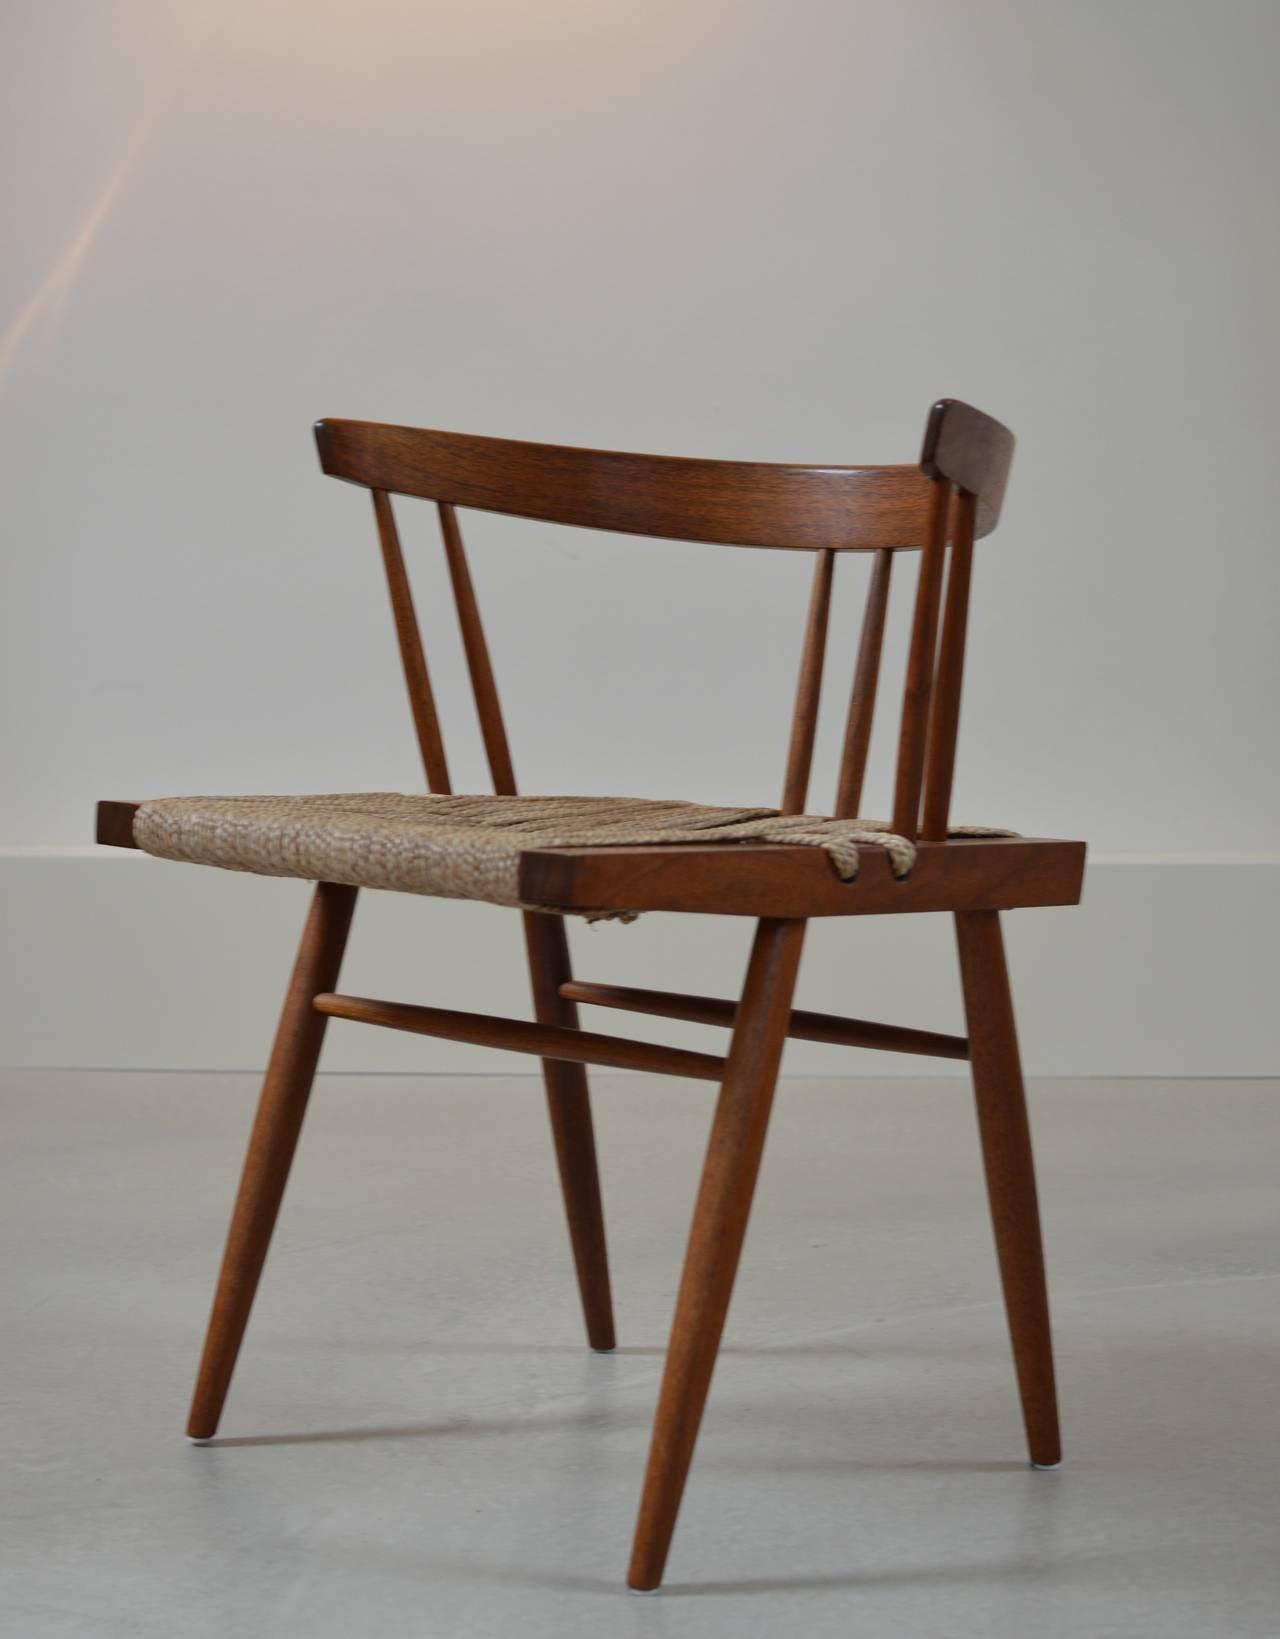 High Quality George Nakashima Black Walnut Grass Seat Chairs 3